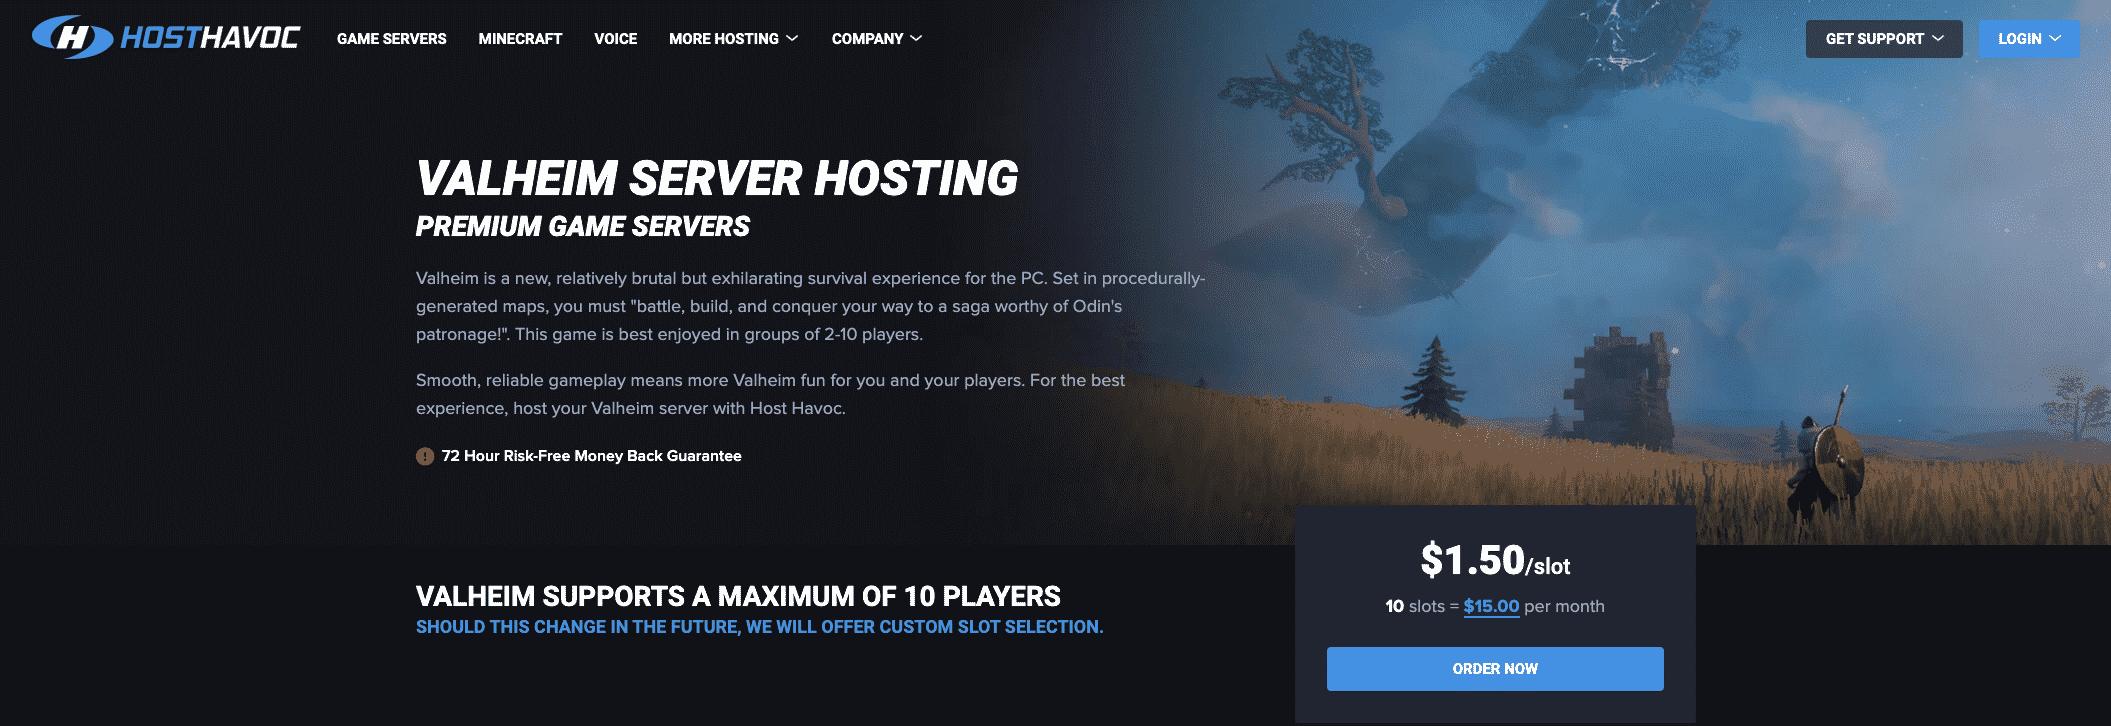 Host Havoc Valheim Server Hosting